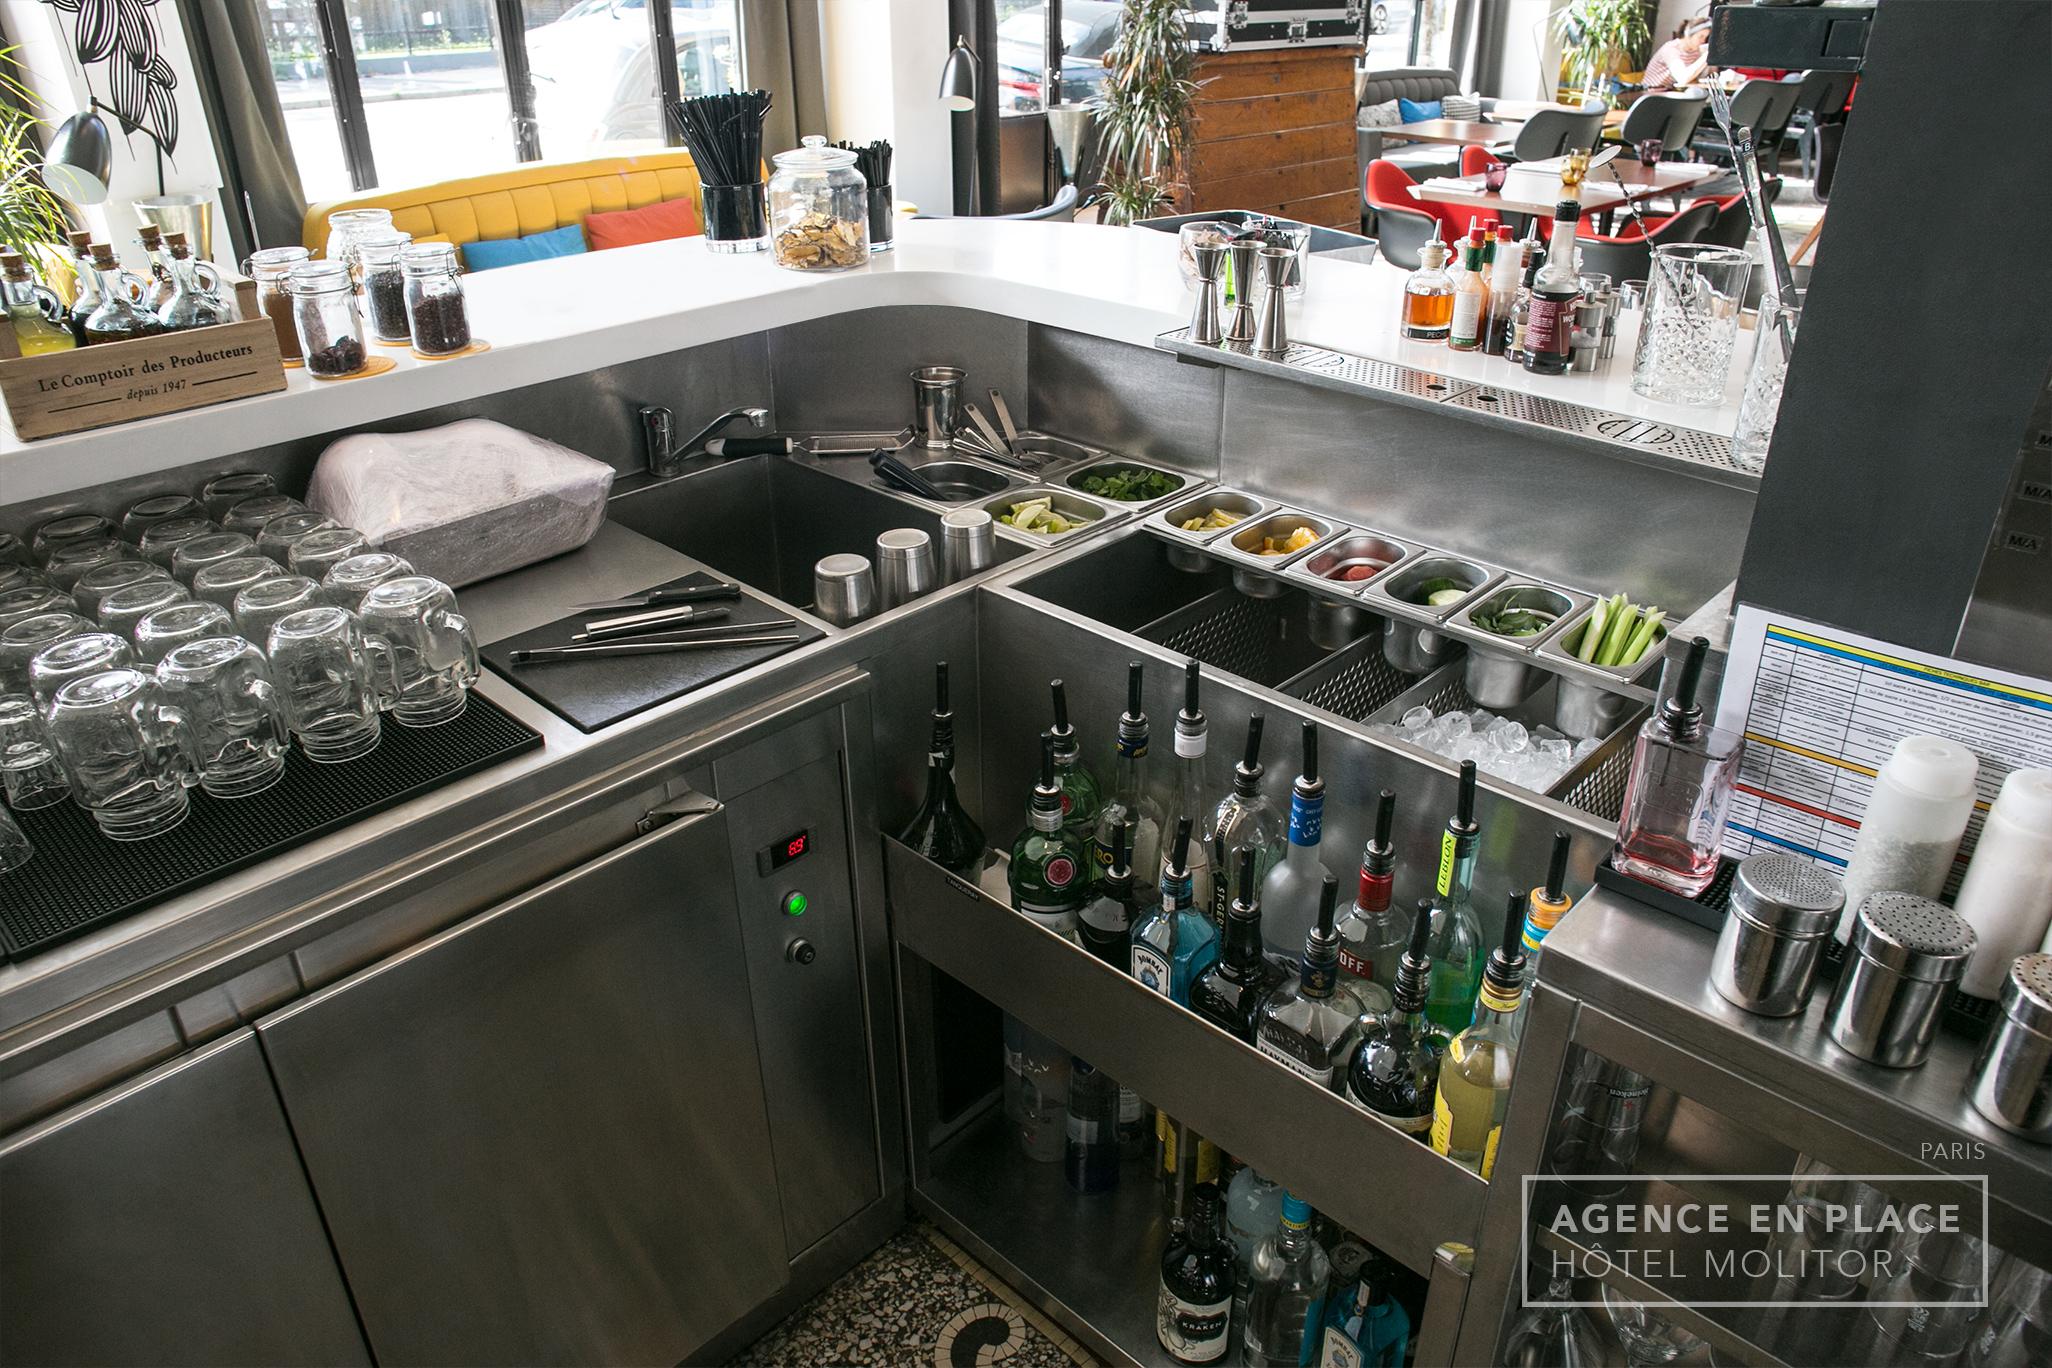 hotelmolitor-agenceenplace-cocktailsbar003